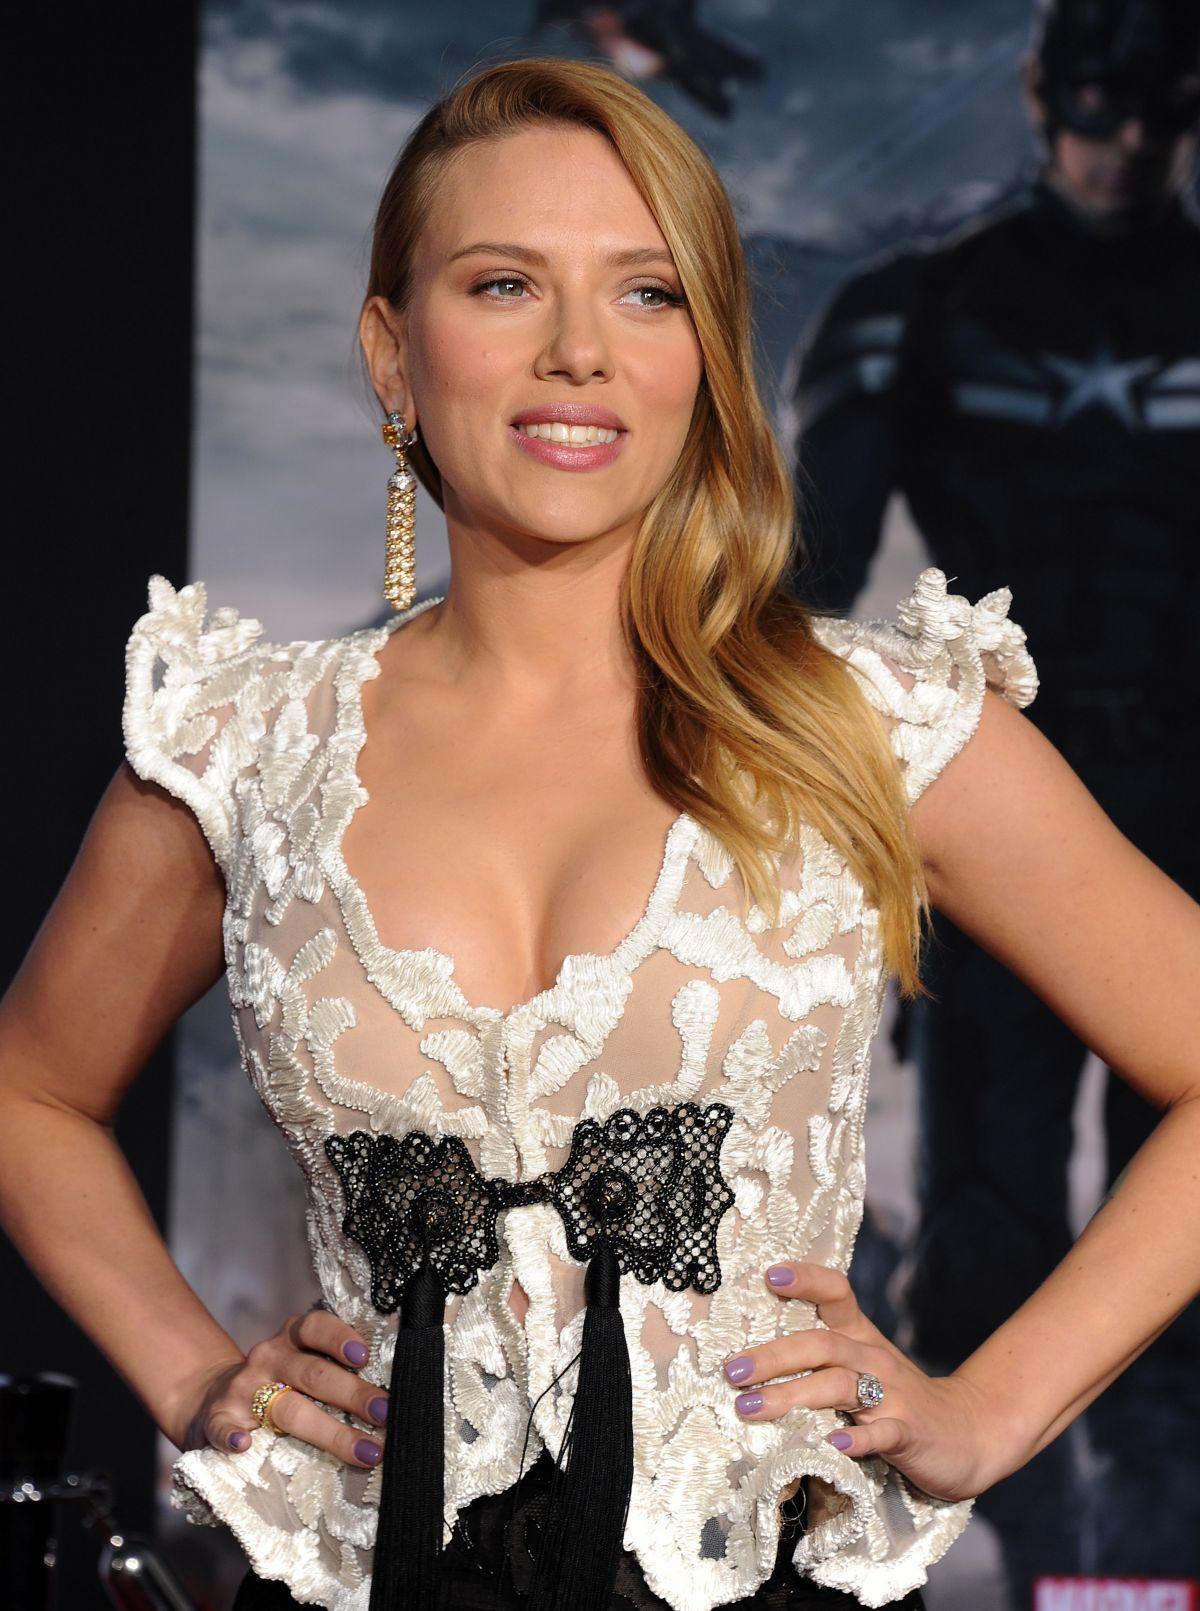 Scarlett Johansson At Captain America The Winter Soldier